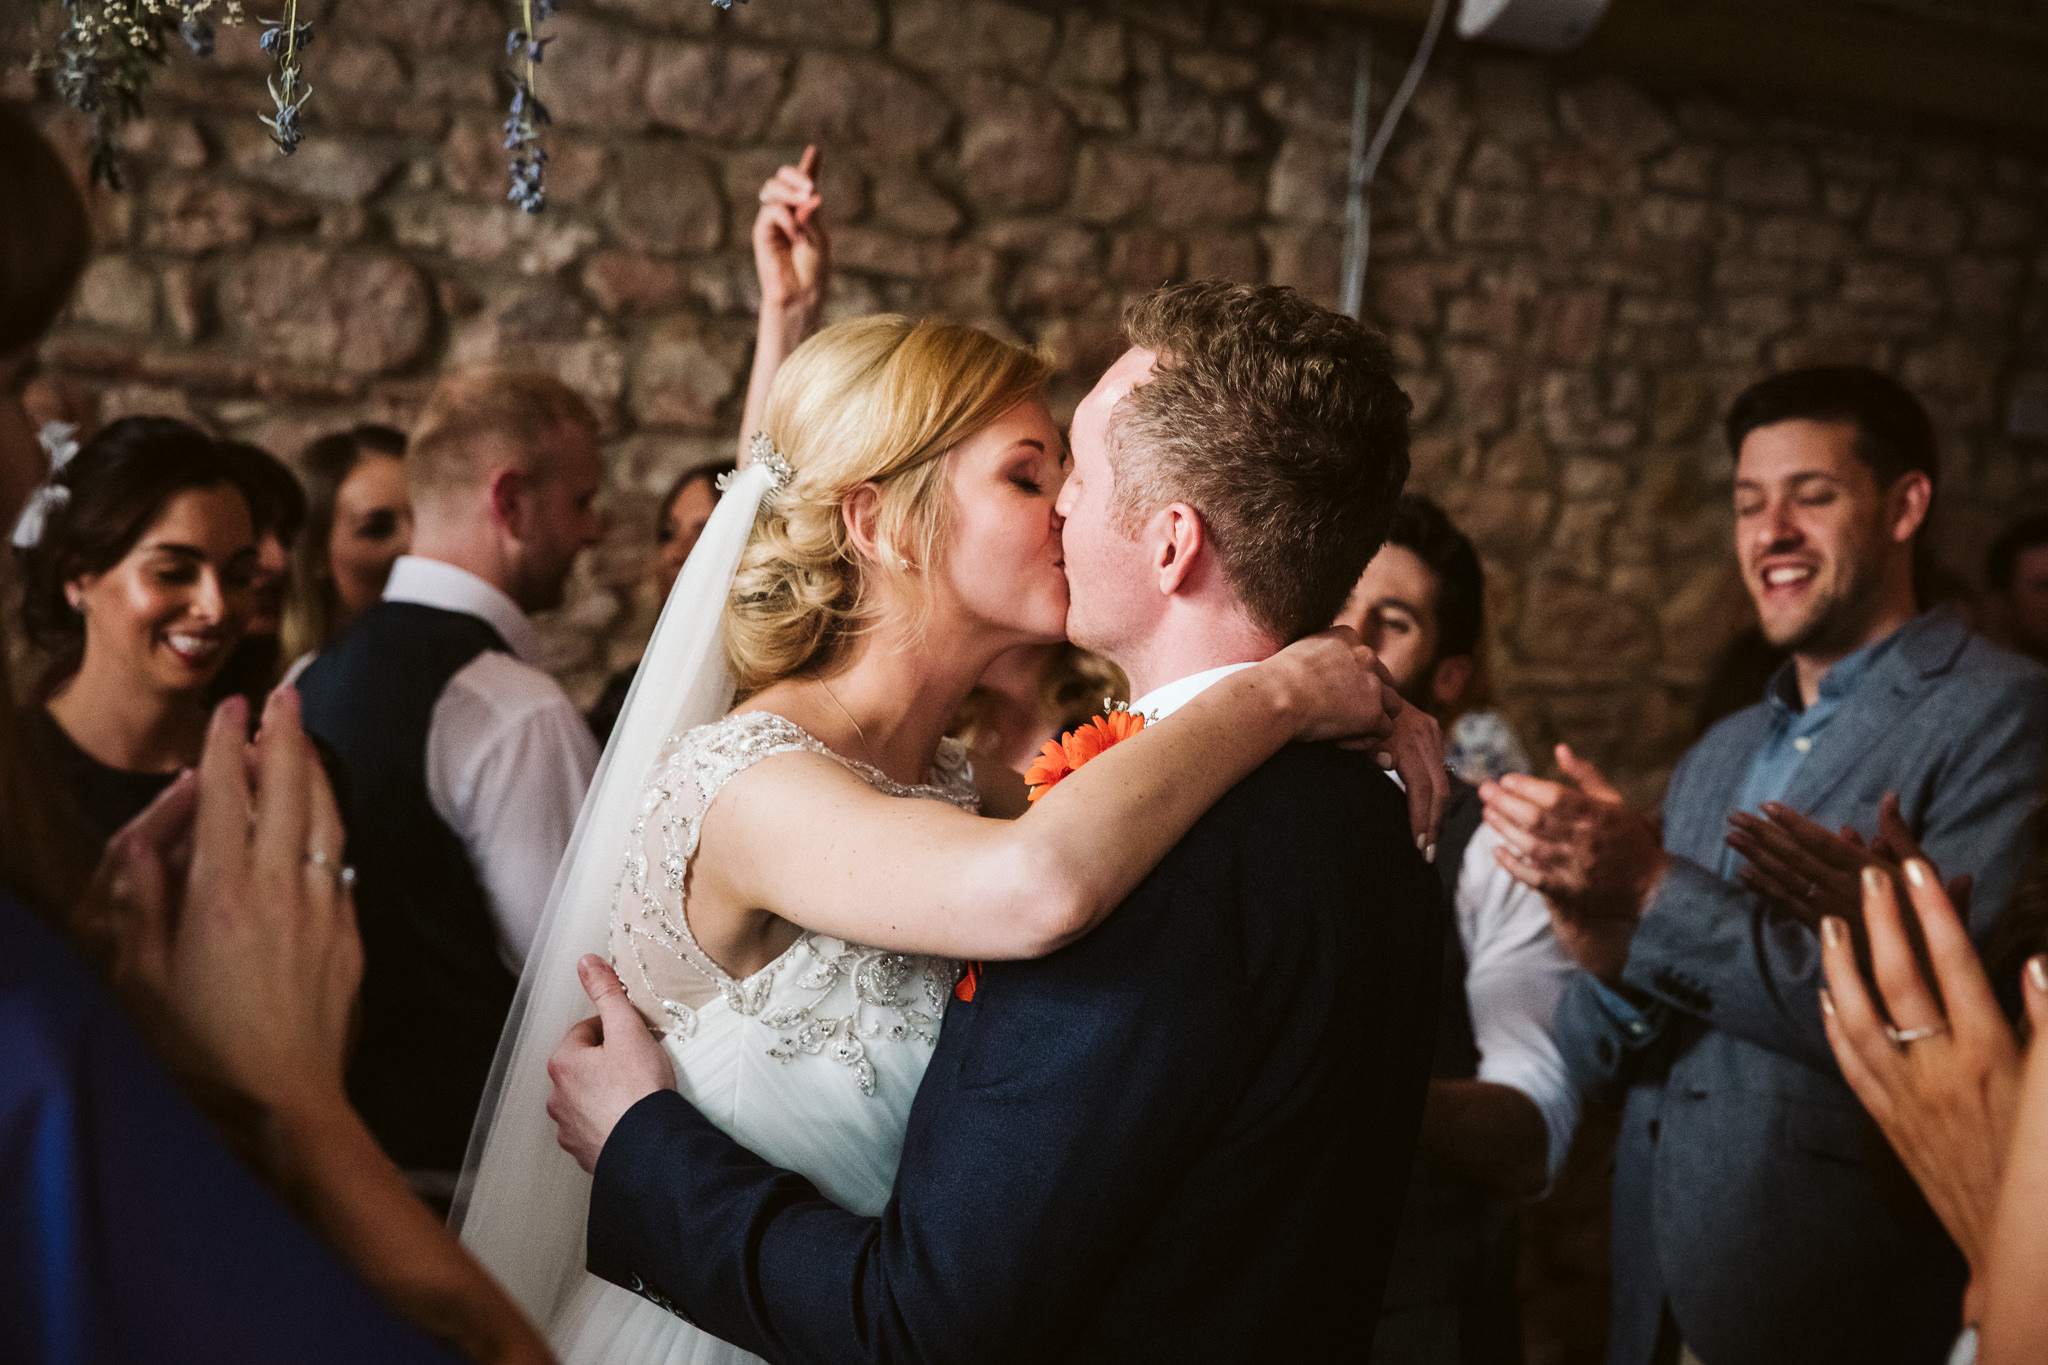 northside-farm-wedding-northumberland-margarita-hope (132).jpg